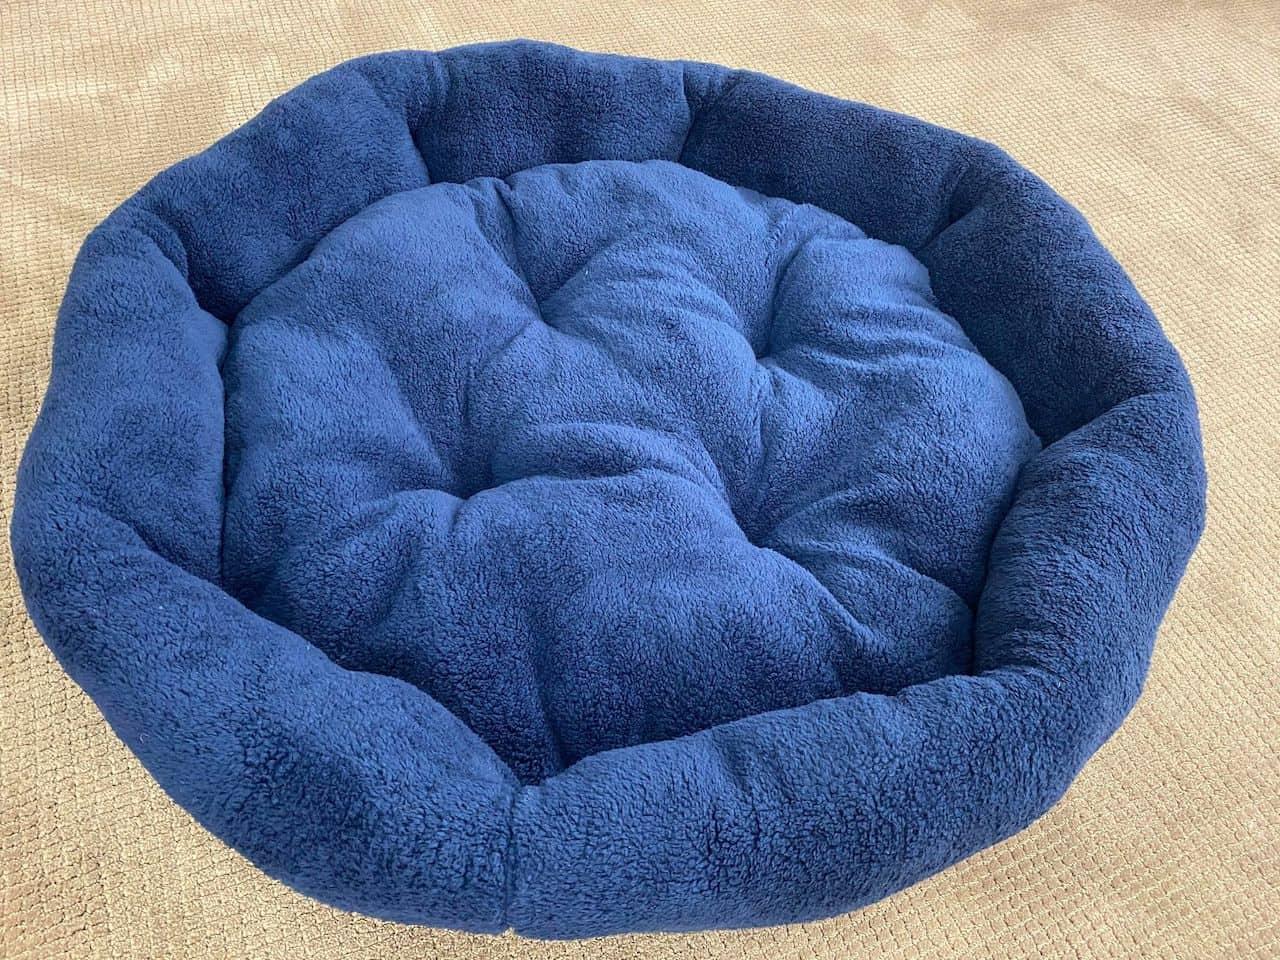 XXL Blue Dog Bed